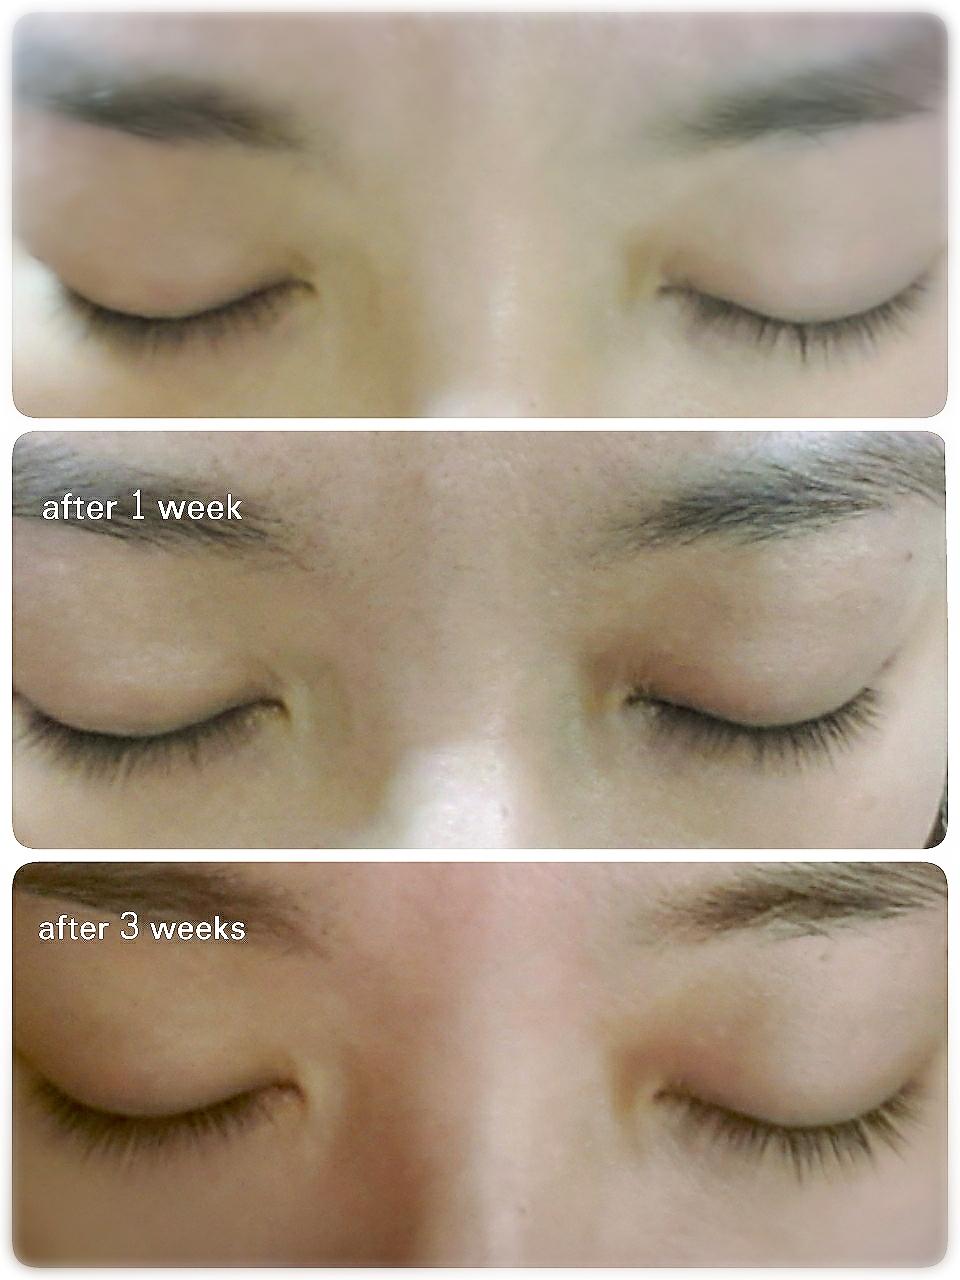 517864aebe5 Shiseido: Shiseido Adenovital Eyelash Serum Review